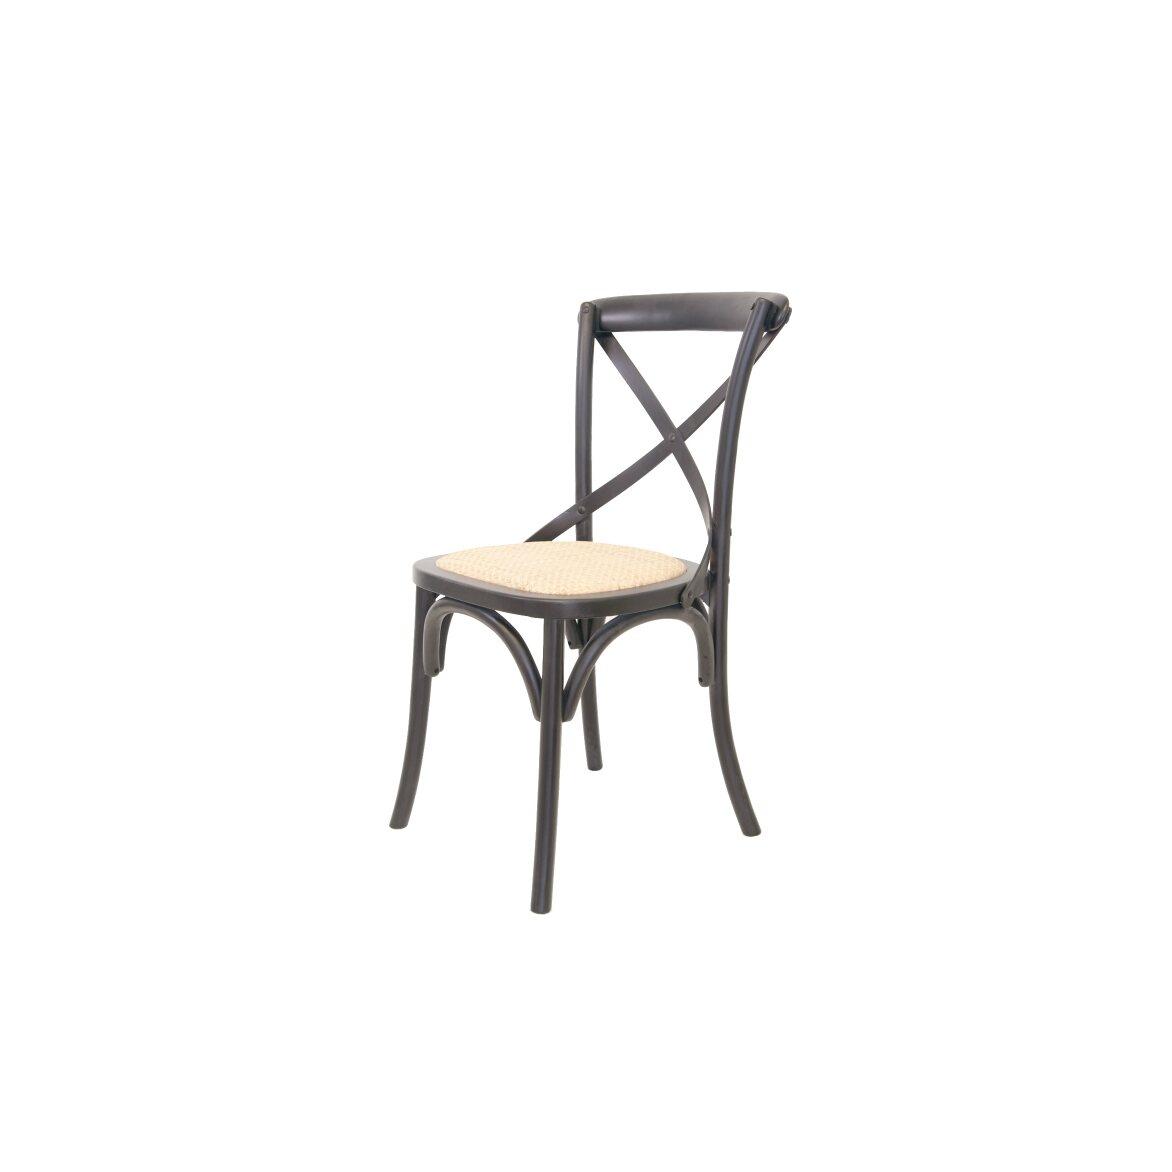 Стул Cross back black 4 | Обеденные стулья Kingsby